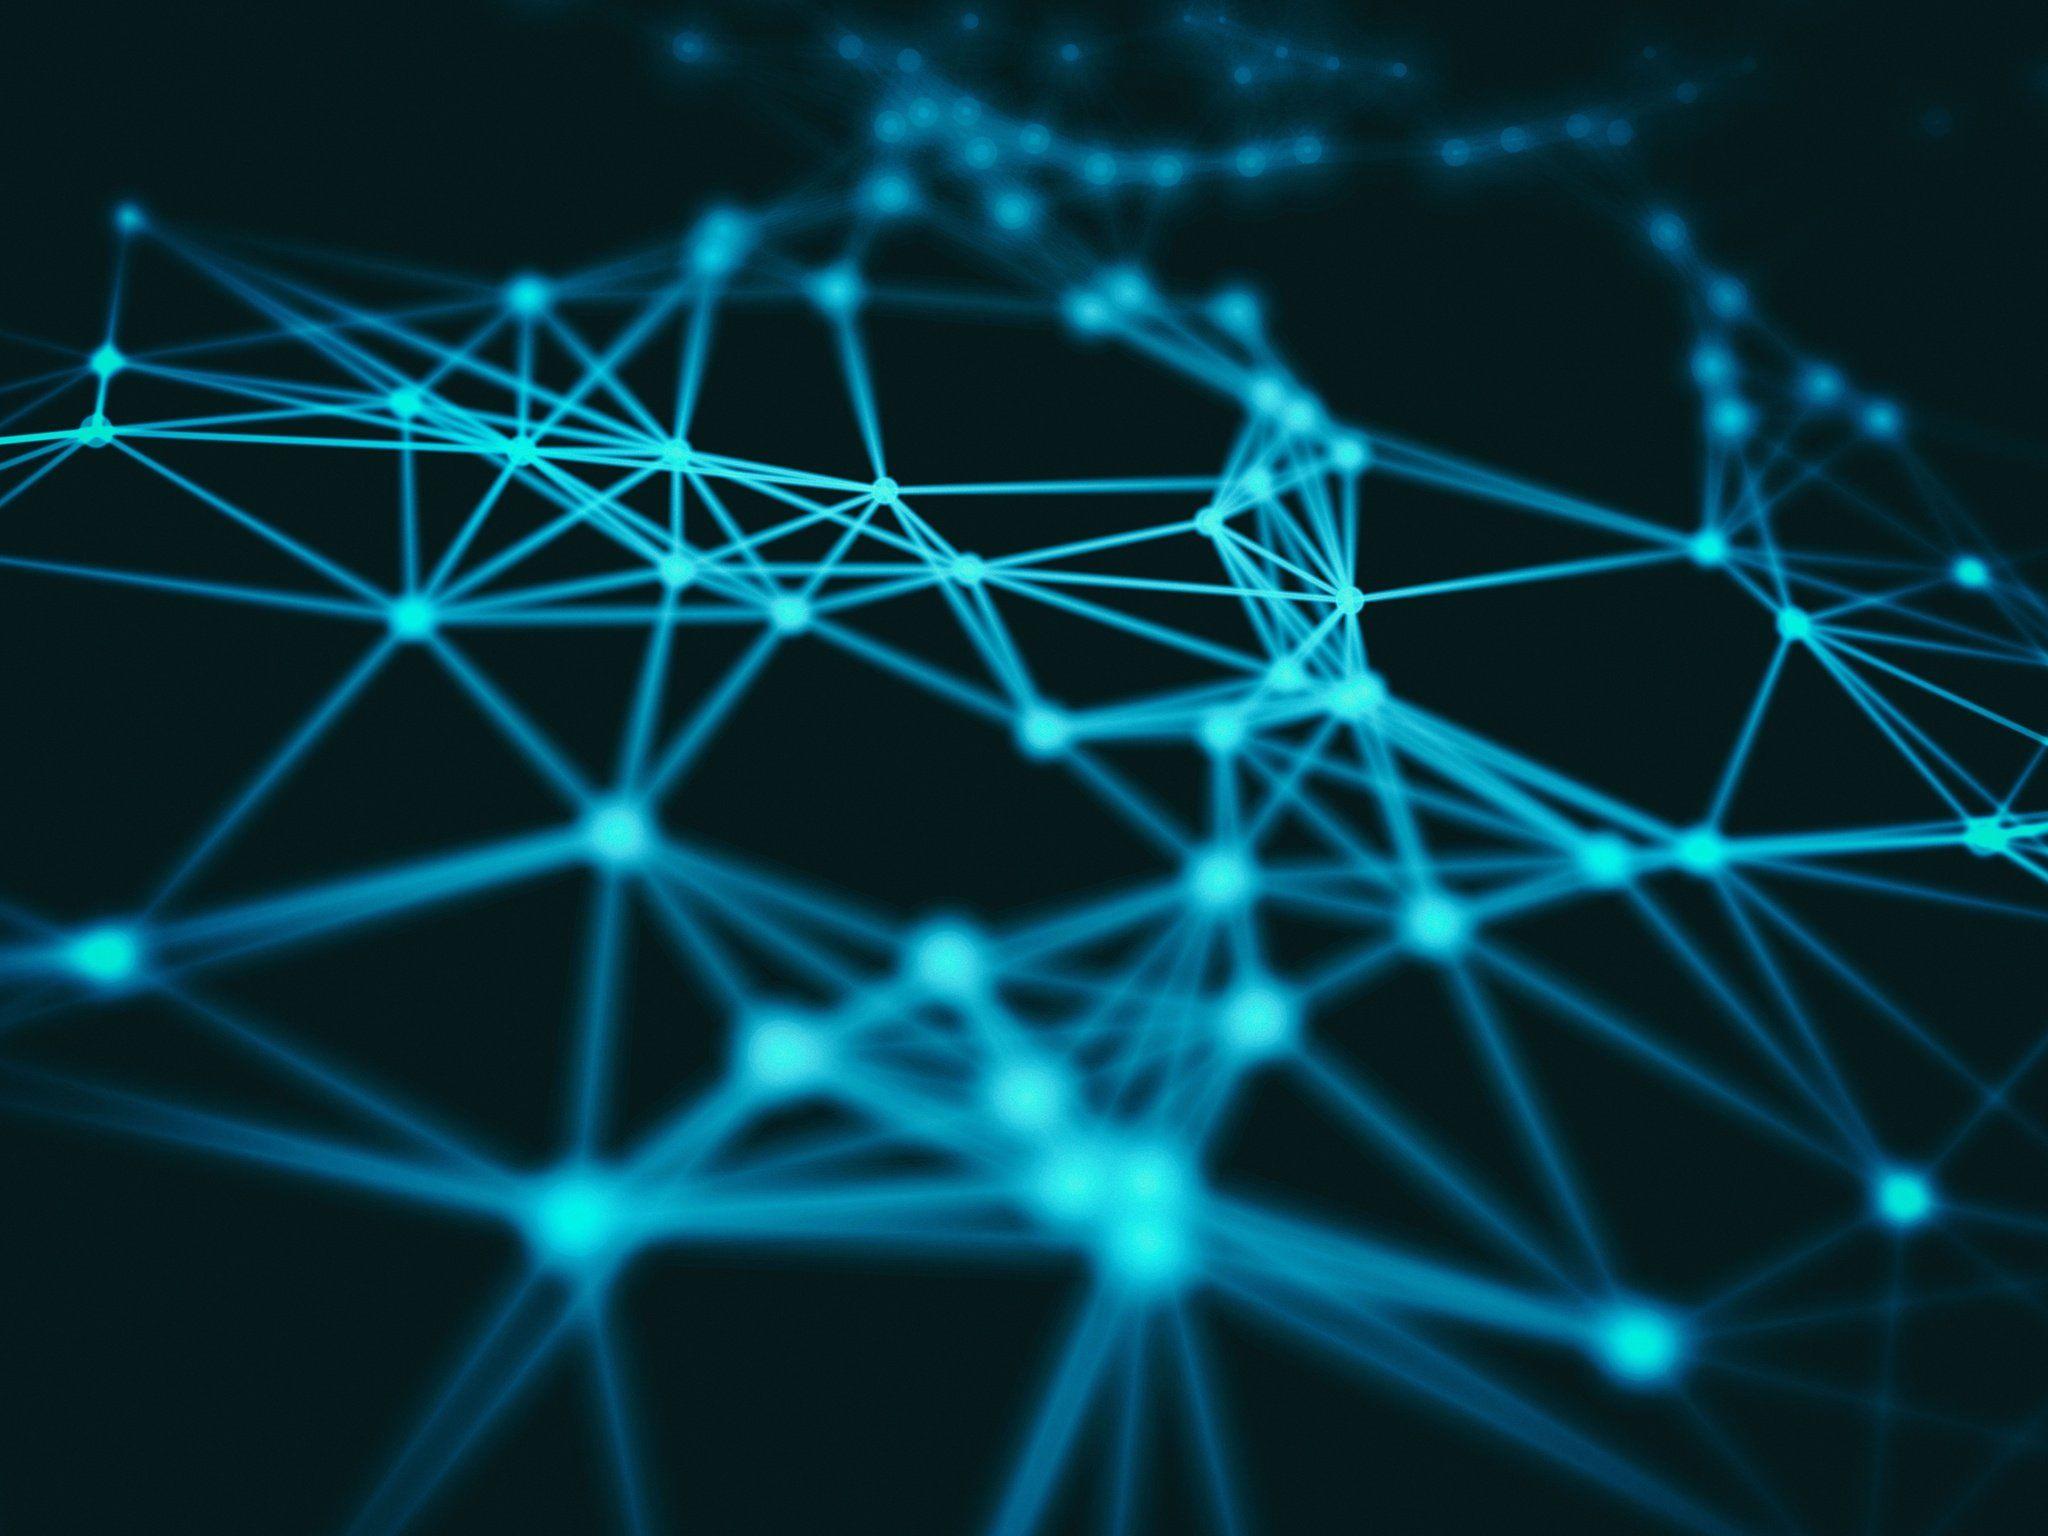 Digital Transformation Underway For Half Of Companies At War With Old Vs New Tech Schools Cio Dive Presentation Techniques Digital Transformation Geometry Digital transformation wallpaper hd